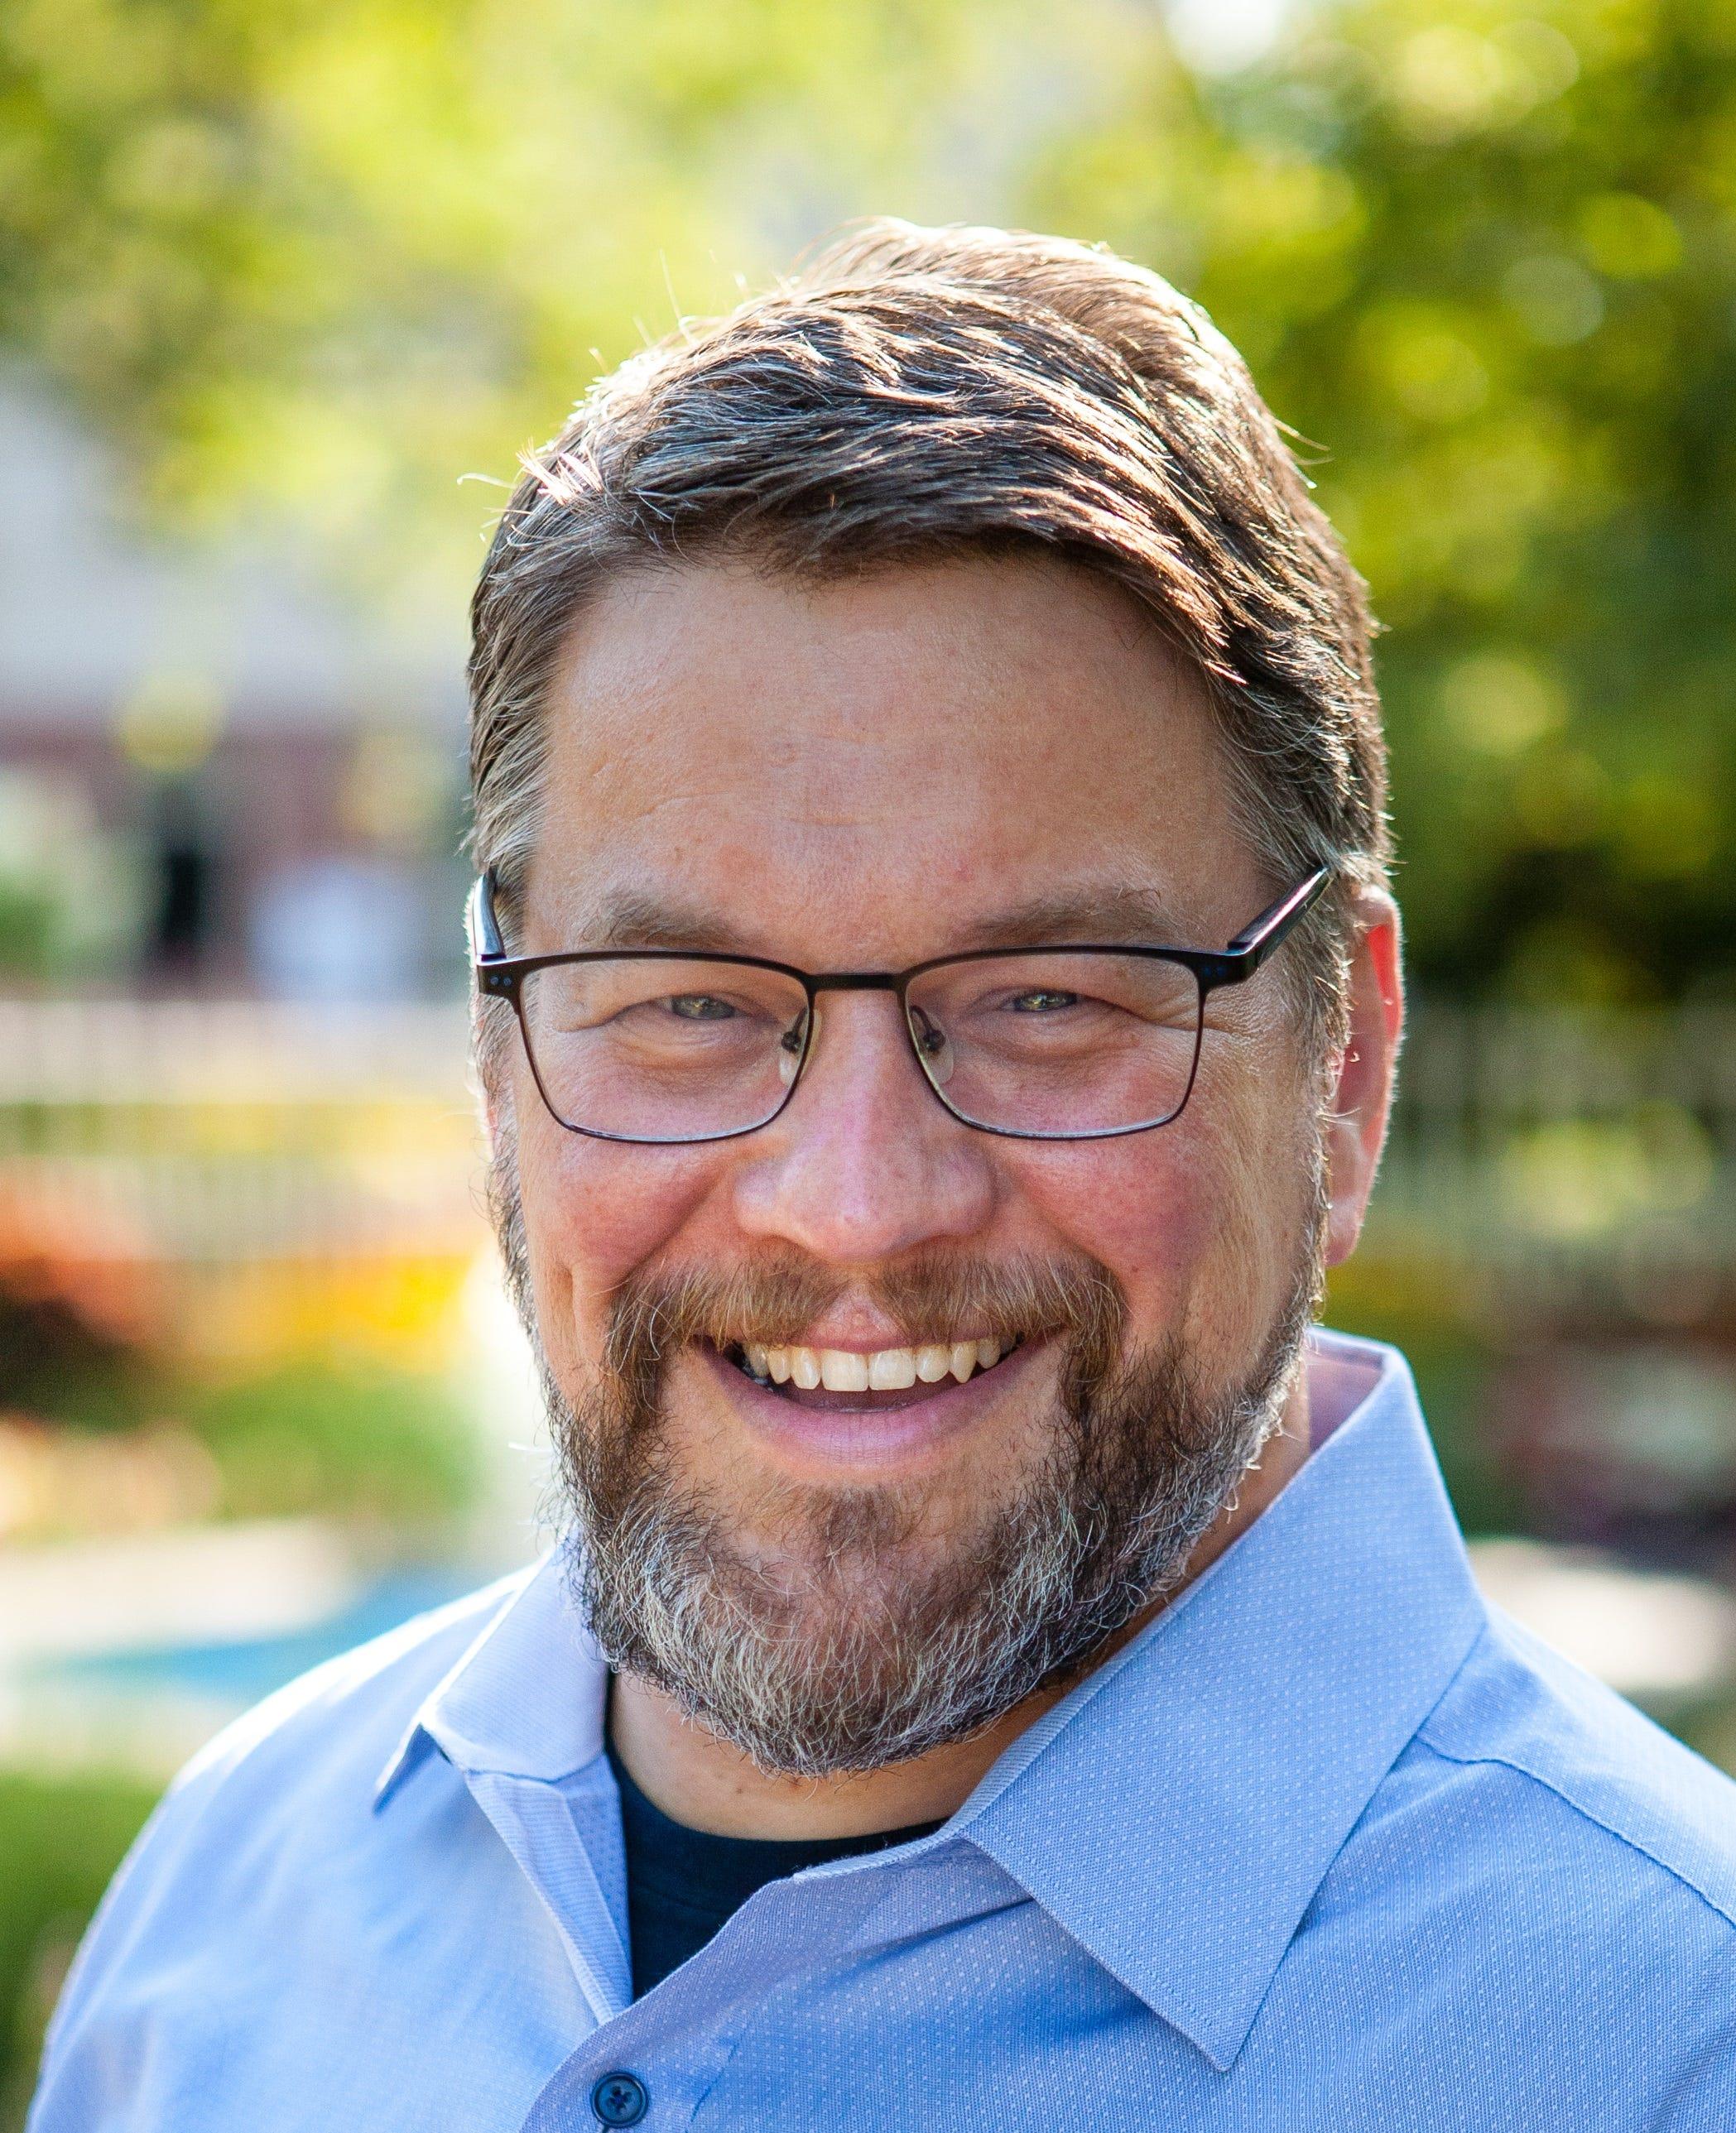 Cliff Lazenby, Portsmouth city councilor.